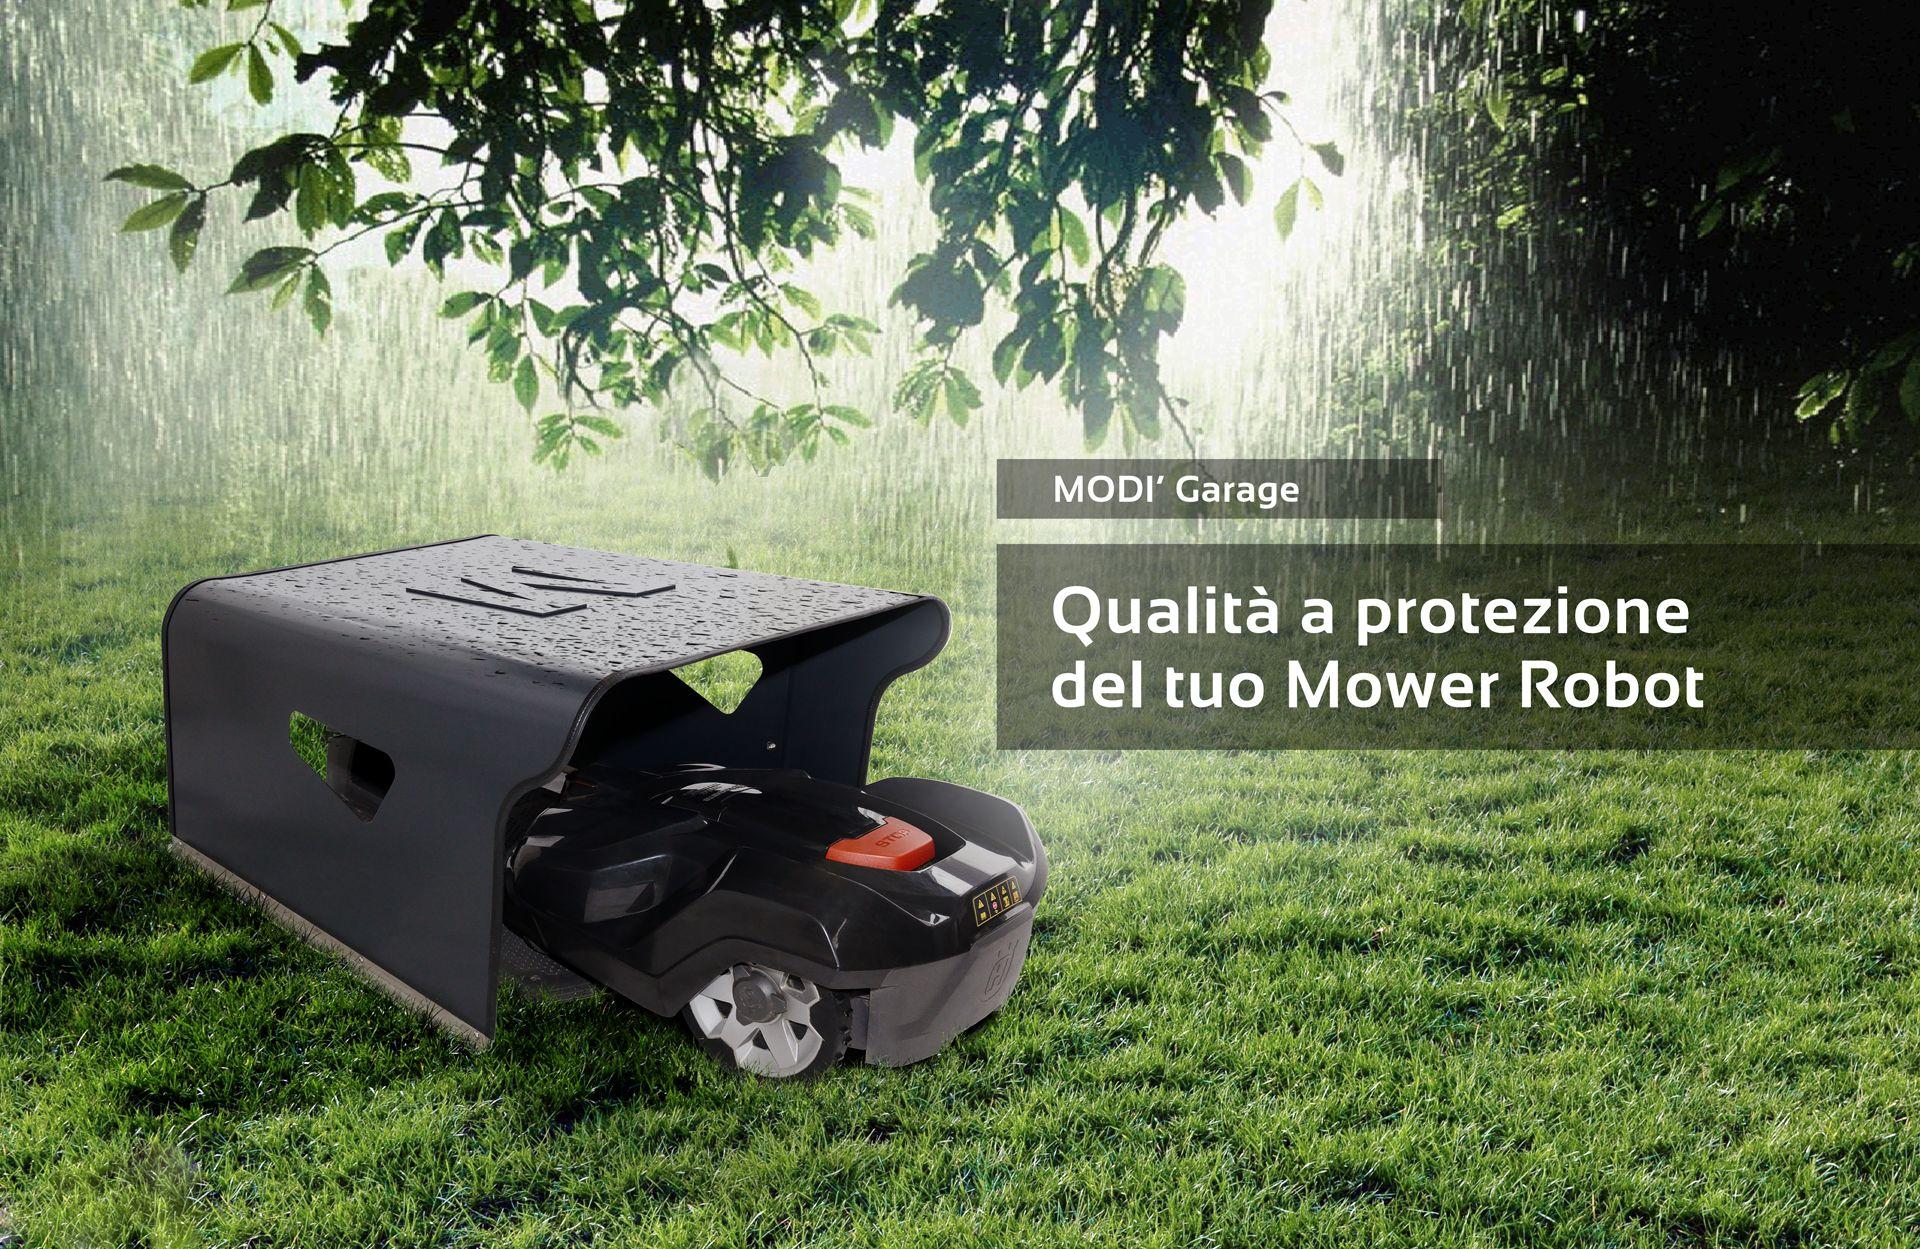 Automower Rasenmaher Roboter Robotic Lawn Mower Tondeuse Robot Garage Www Idea Mower Eu Design Semplice Rasenmaher Roboter Rasenmaher Roboter Garage Roboter